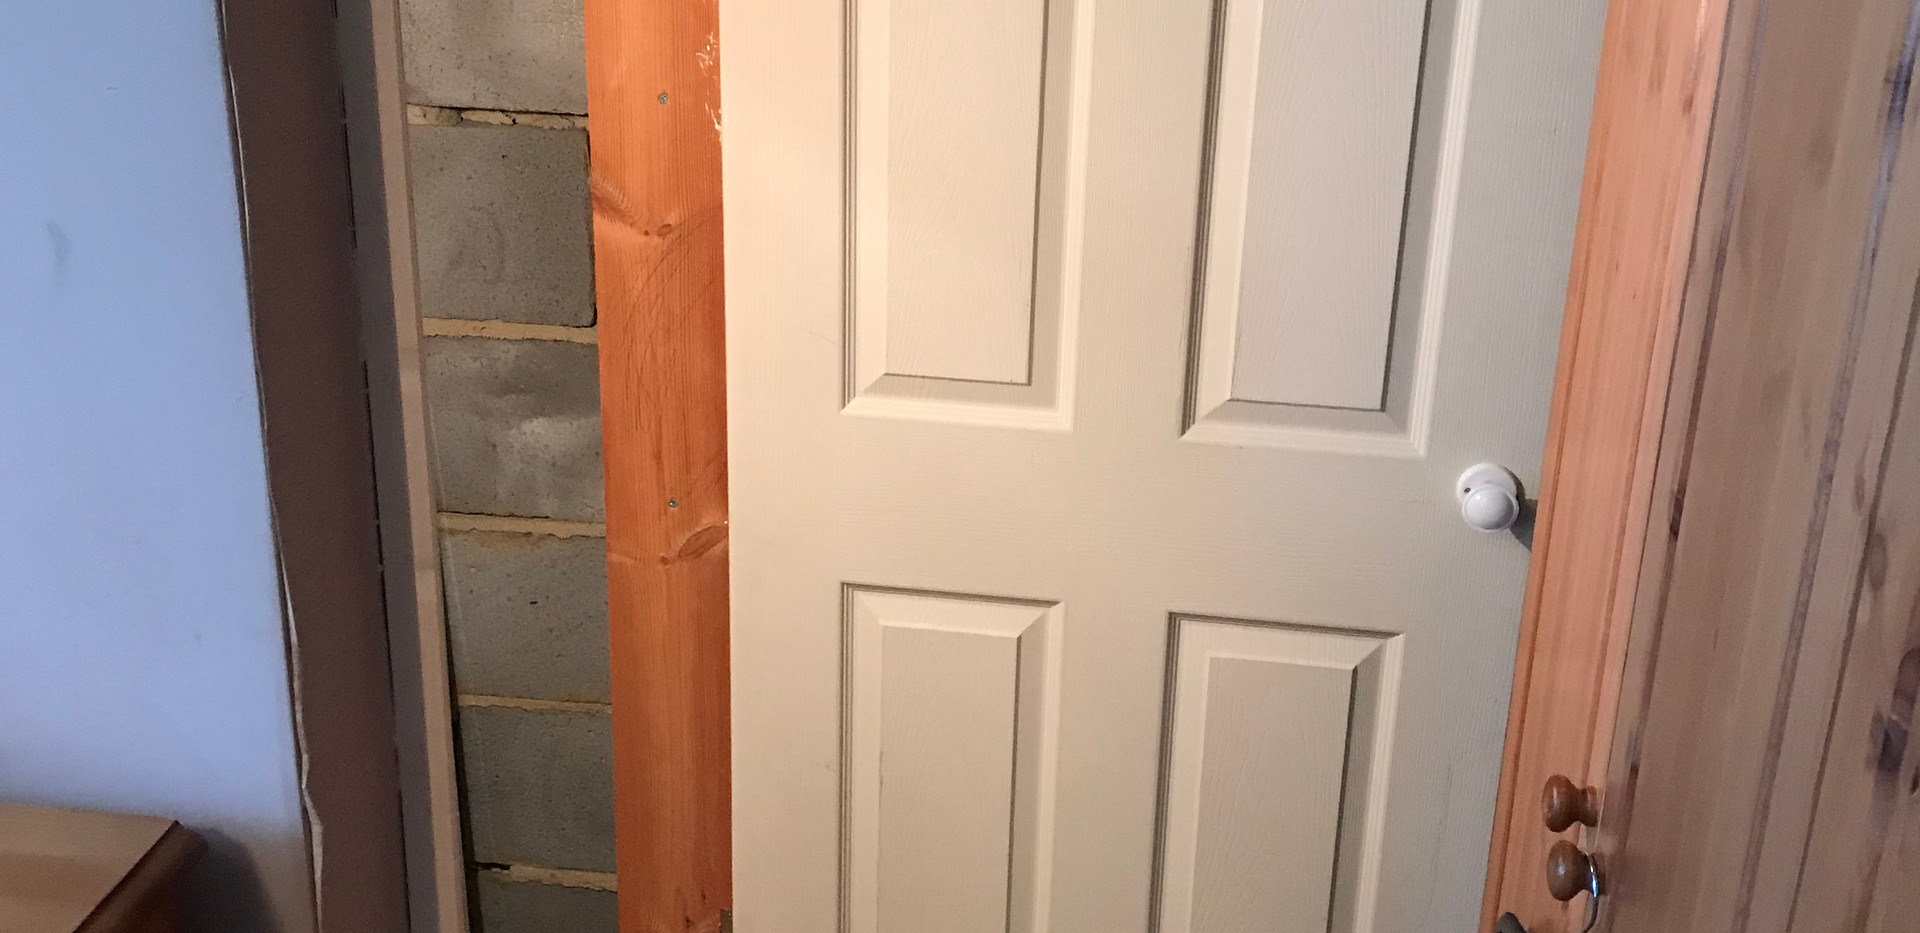 Eaves cupboard storage door